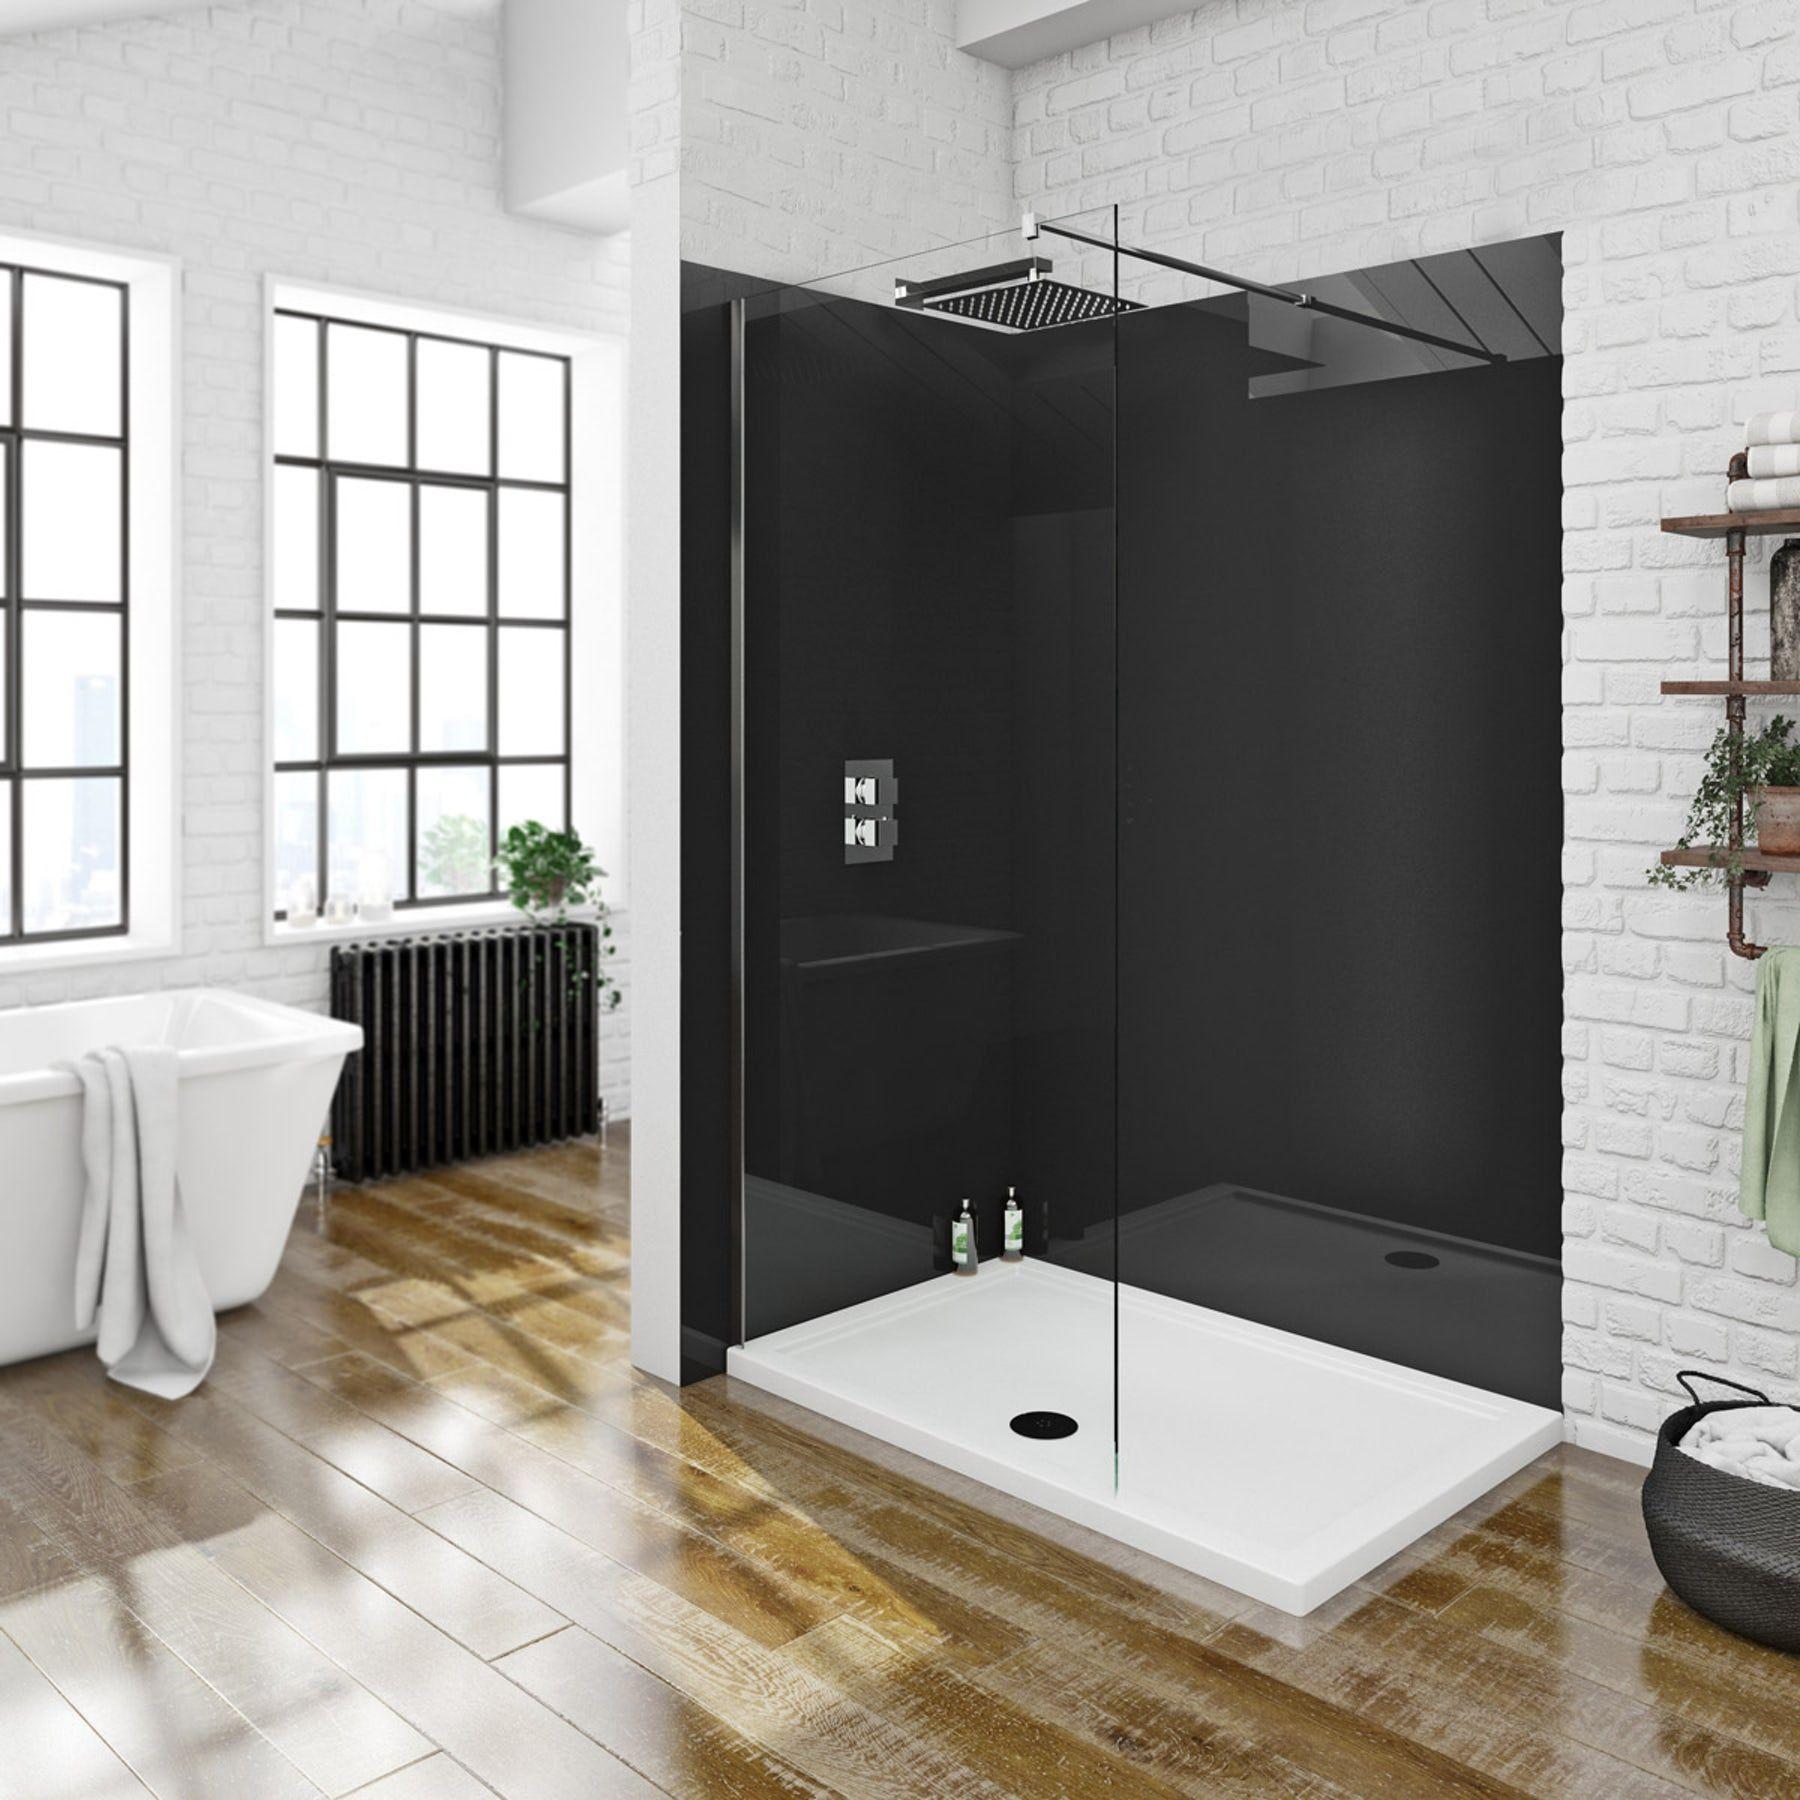 Zenolite Plus Jet Acrylic Shower Wall Panel 2070 X 1000 Victoriaplum Com Acrylic Shower Walls Shower Wall Panels Shower Wall